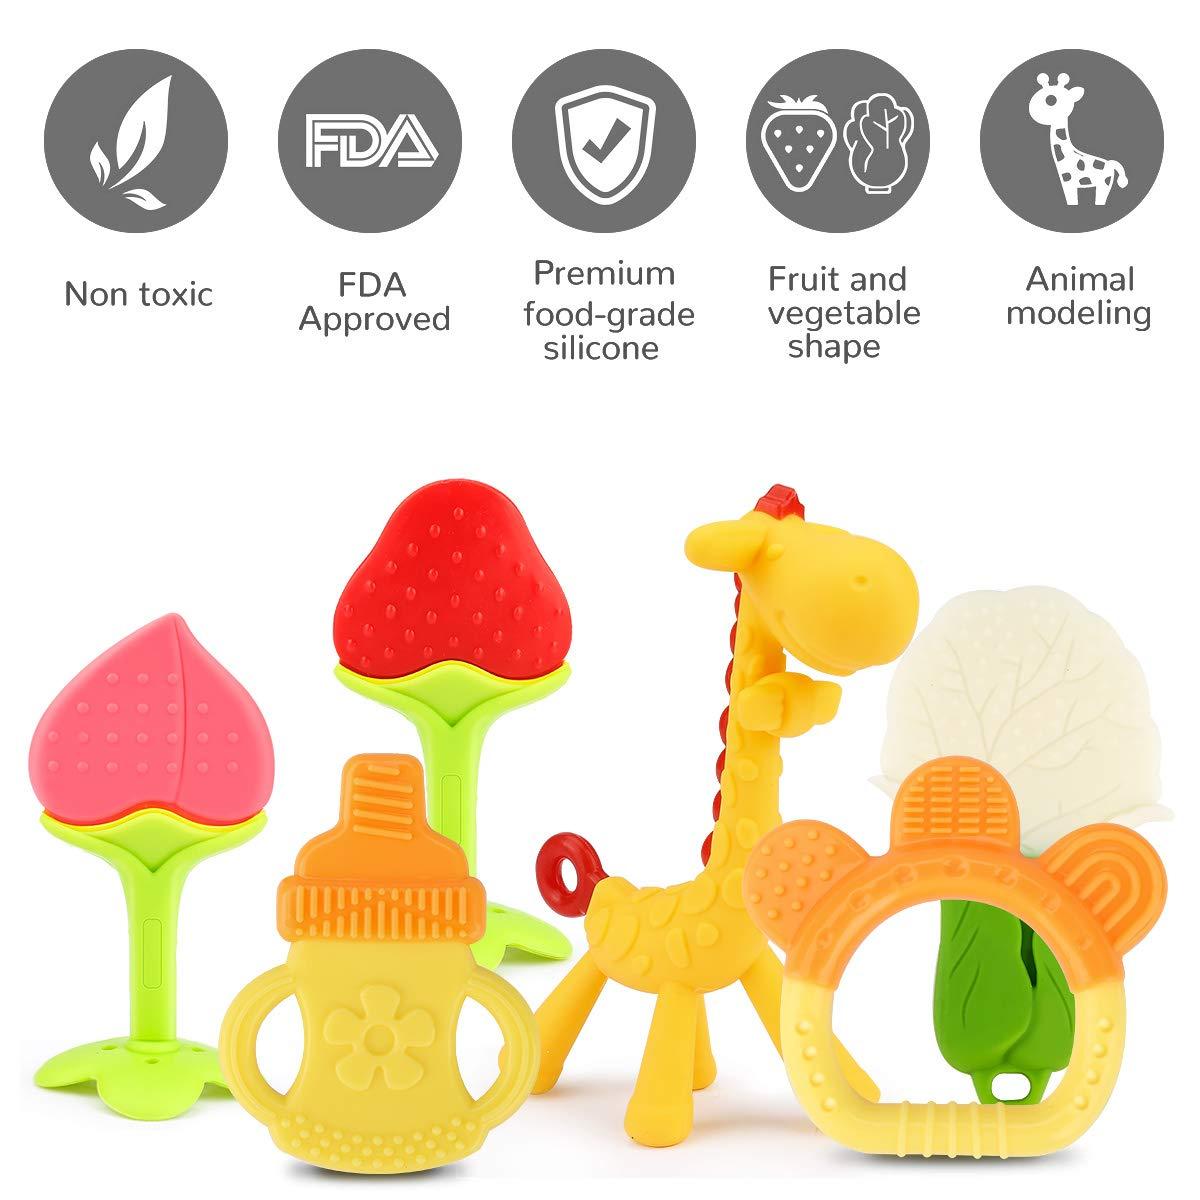 6er Set ab 3 Monaten Kleinkinder Zwini Baby Bei/ßspielzeug Set Soft Sensory Baby Bei/ßring Silikon Bei/ßschnuller Kaumassage Bei/ßring Set f/ür Babys